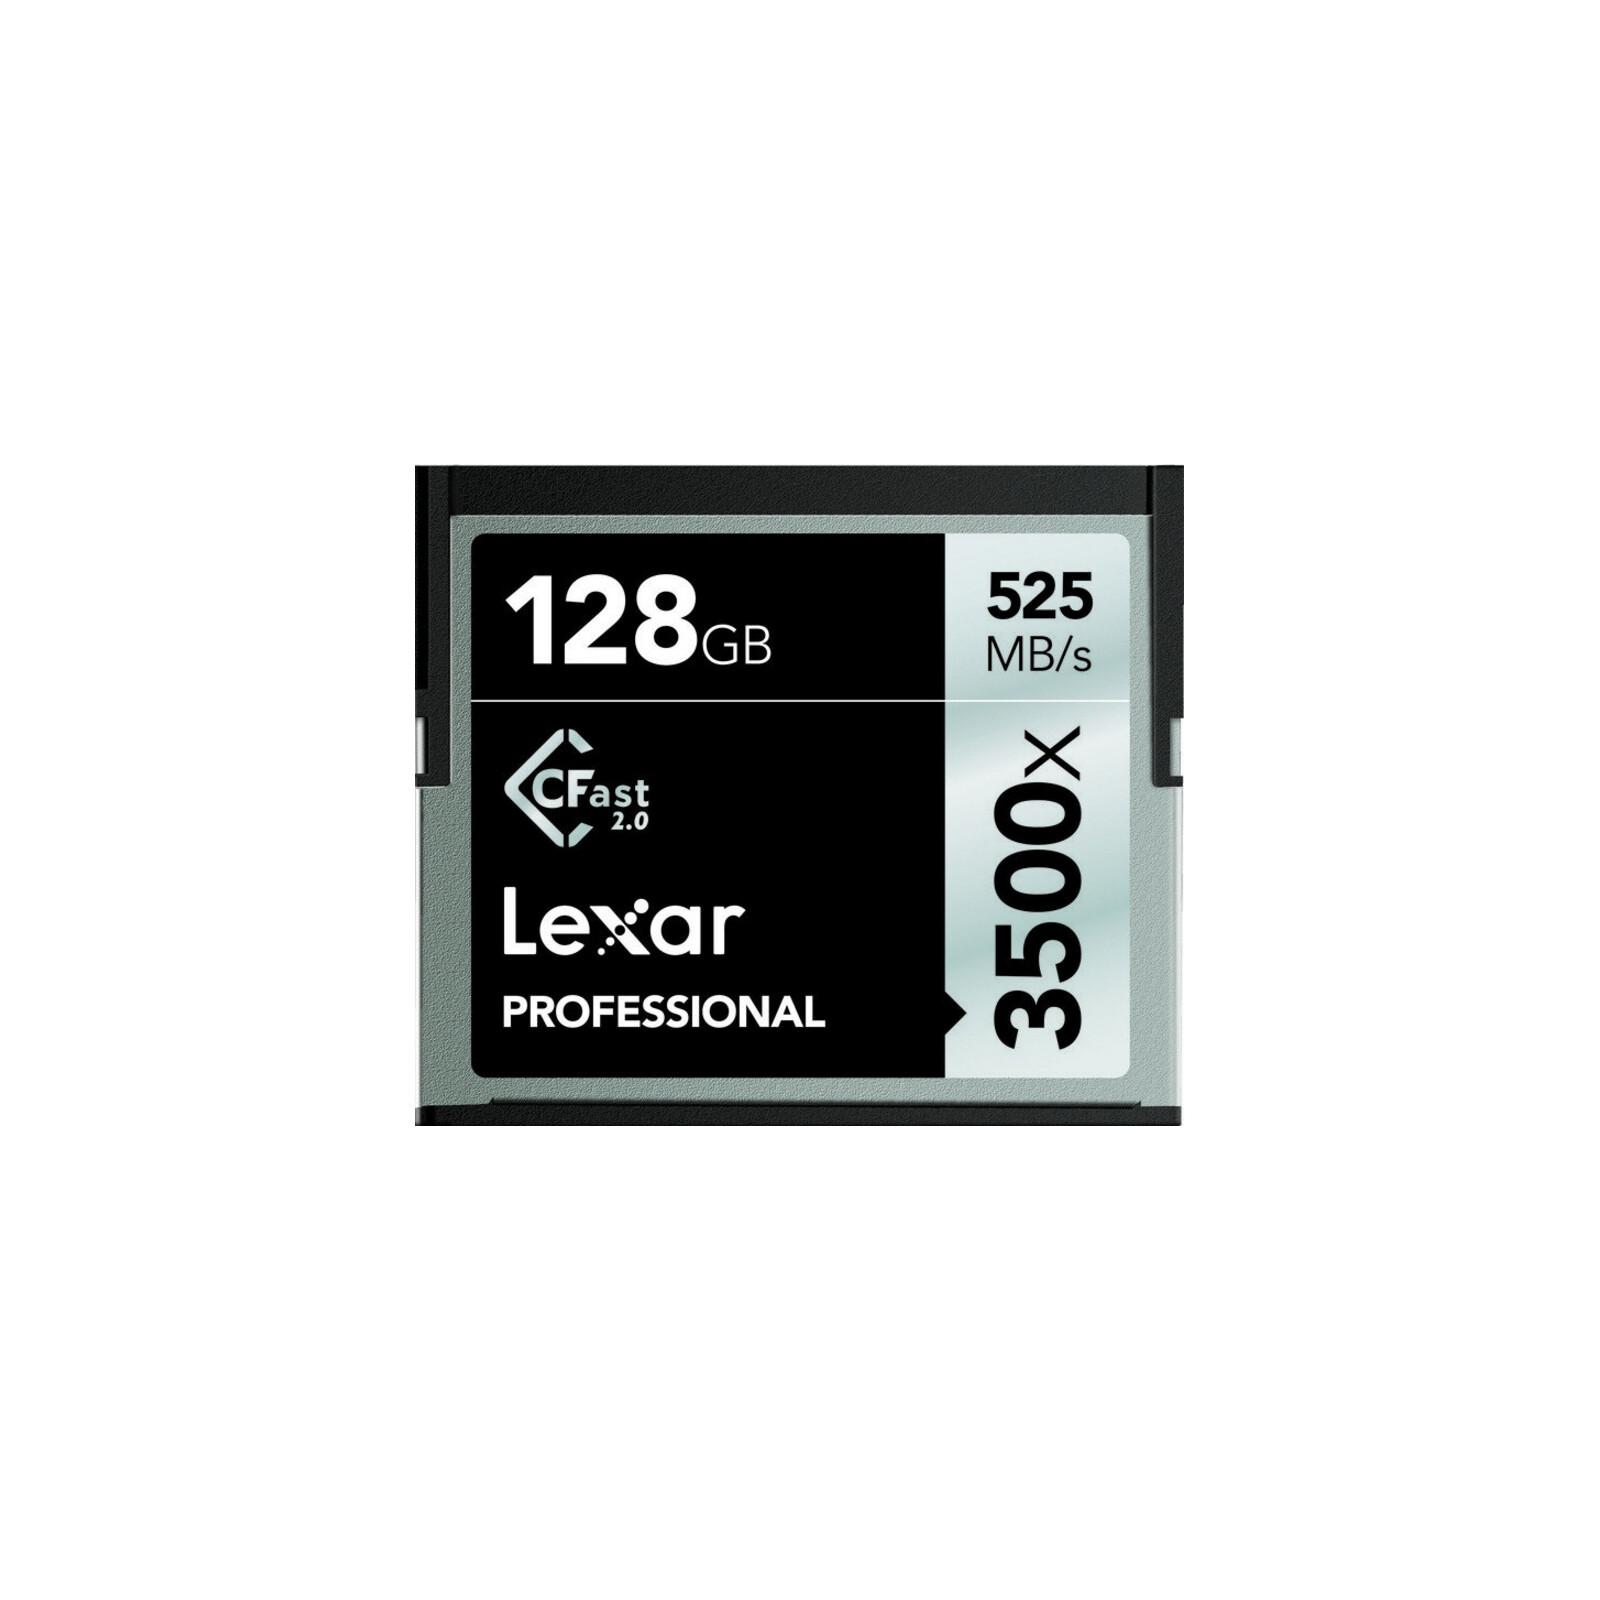 Lexar Cfast 128GB 525MB/s